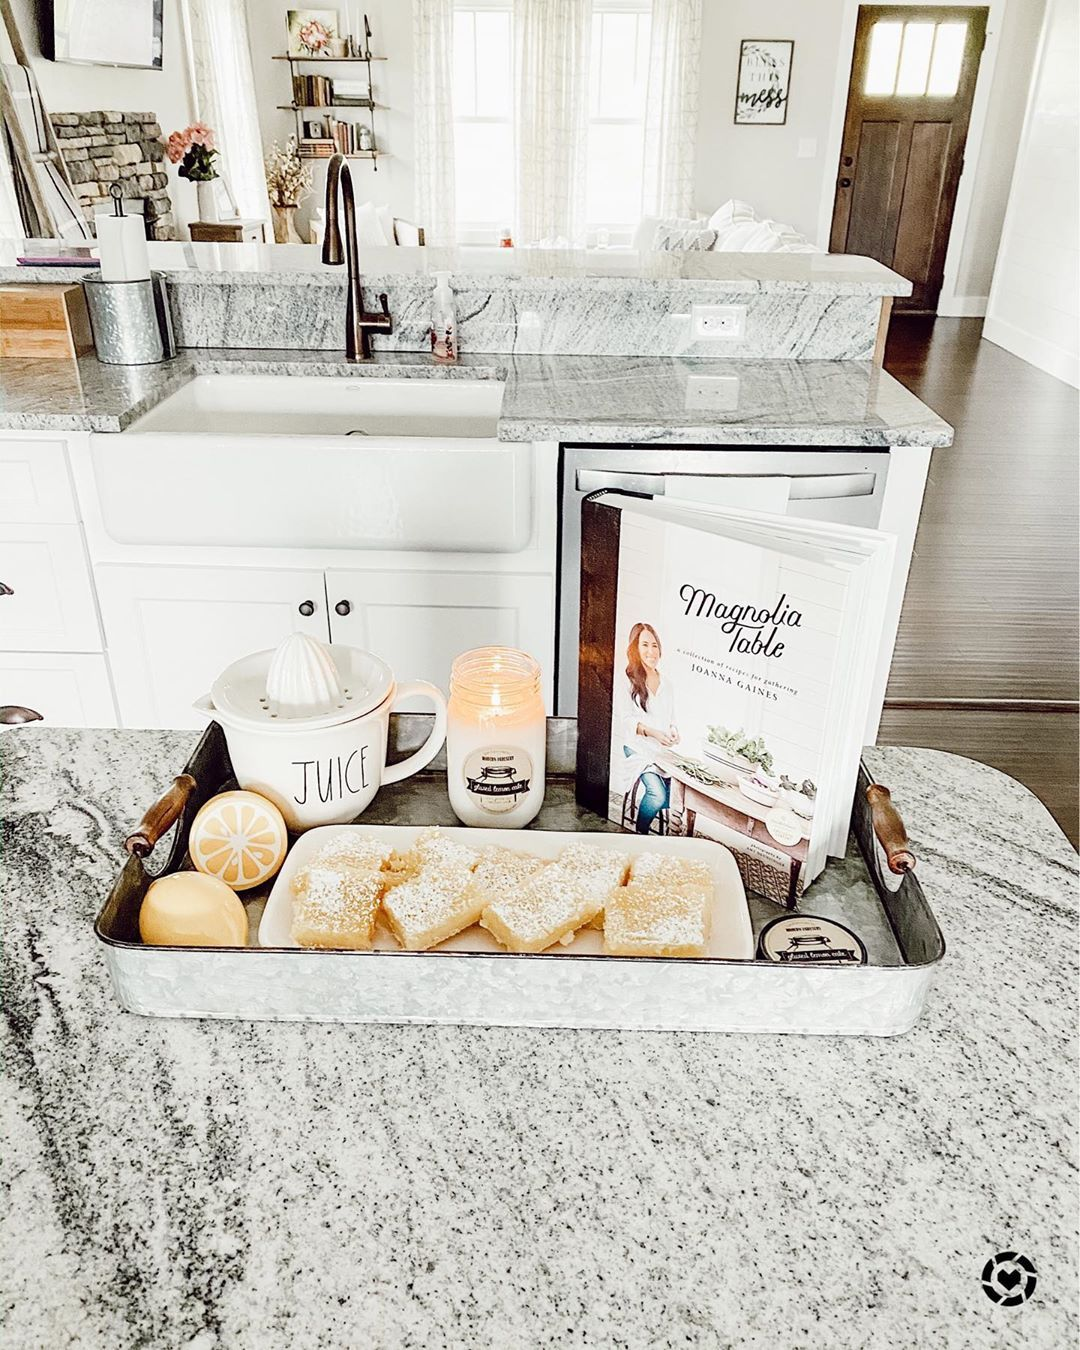 Modern Farmhouse Decor Charity On Instagram I Need The New Magnolia Table Cookbook Because I Keep Making Recipes Fro Lemon Bars Easter Dessert Magnolia Table